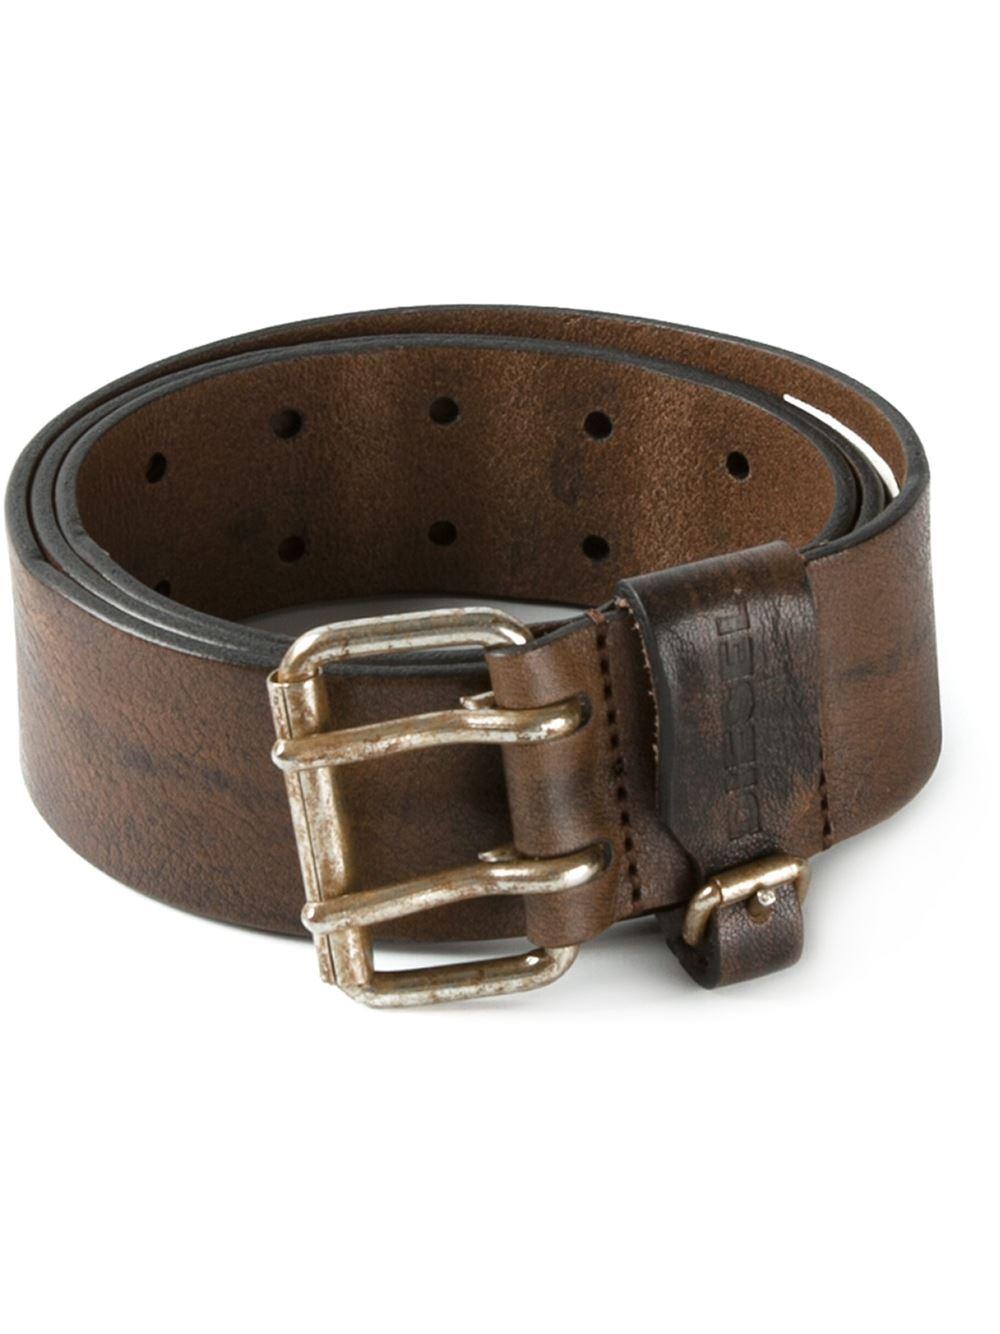 Diesel Belts For Men 92